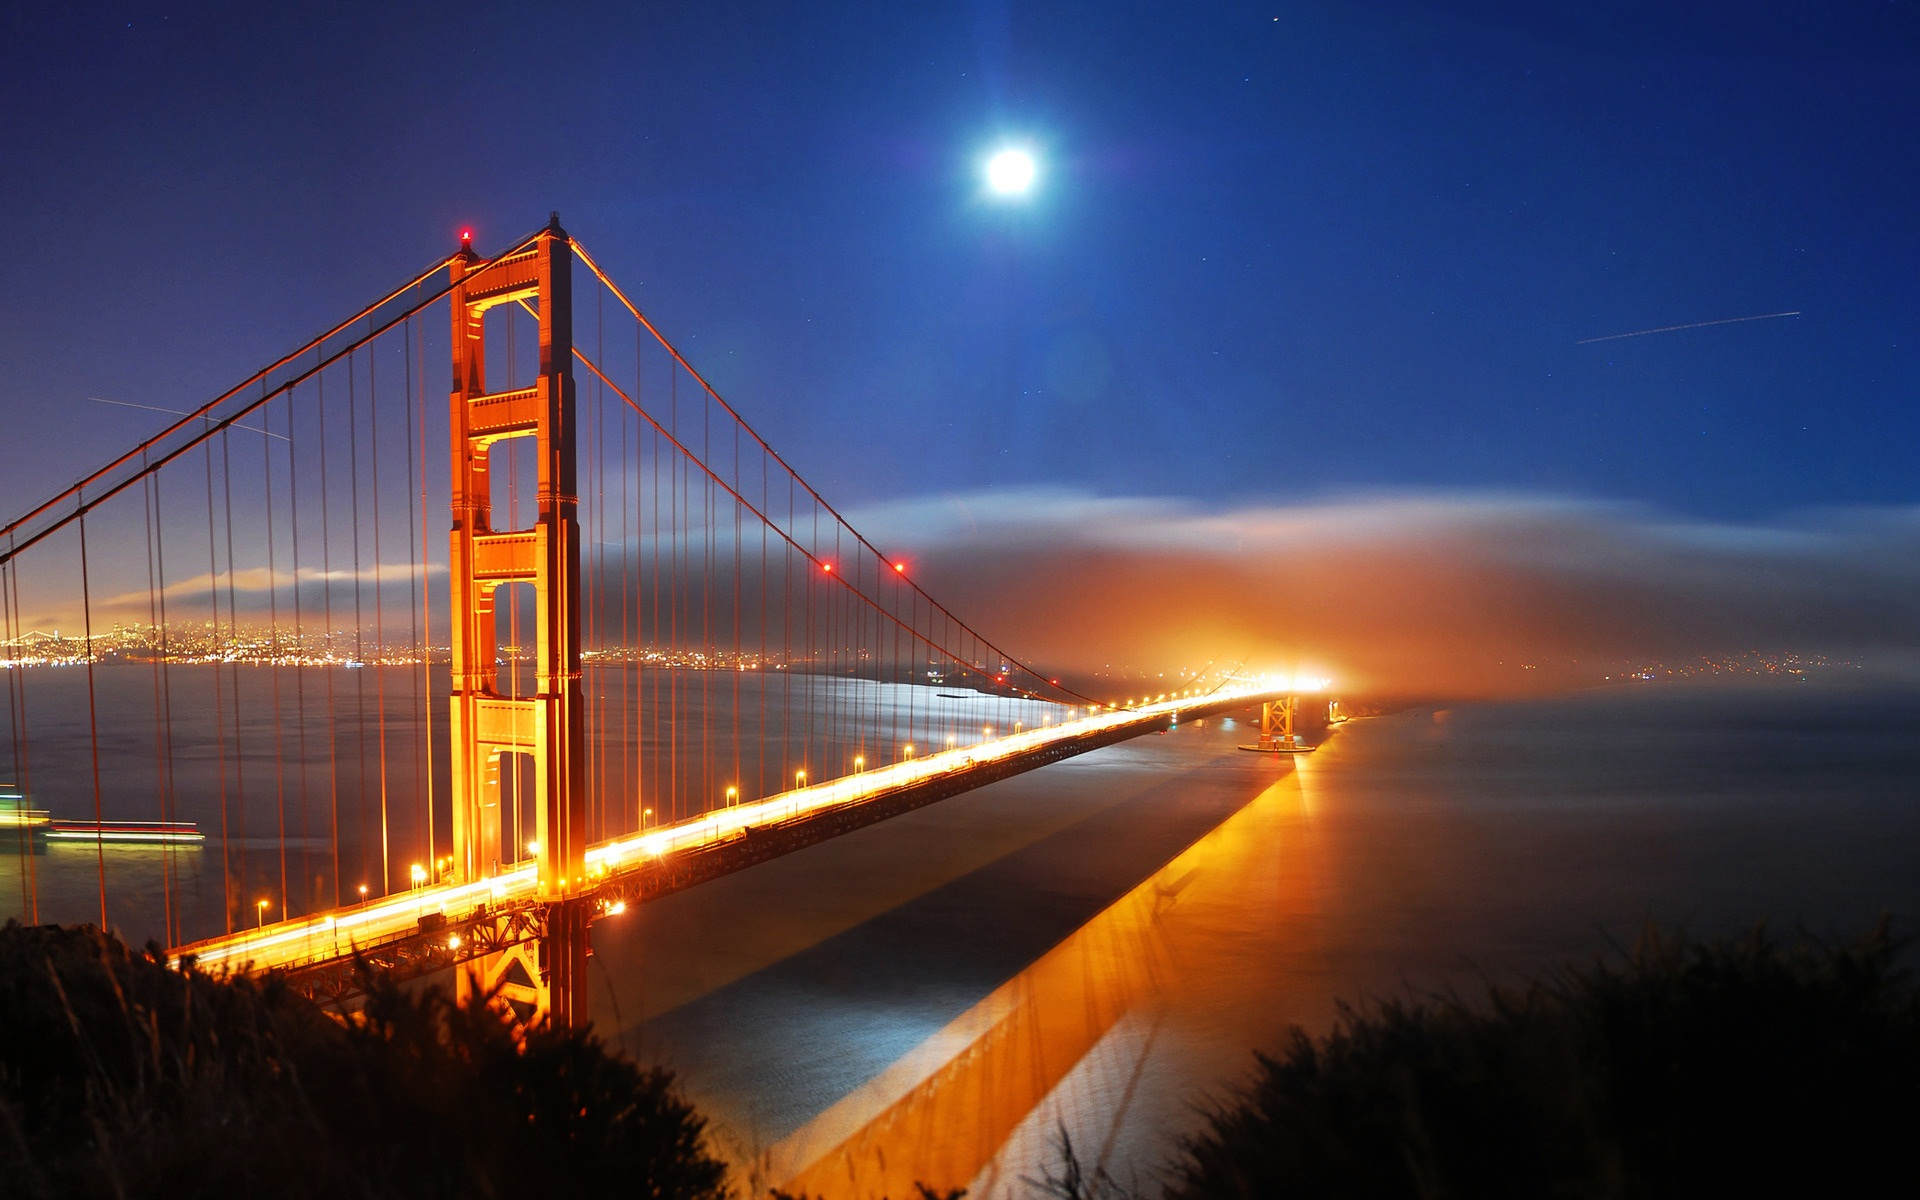 San Francisco Bridge Night Lights Wallpapers HD Wallpapers 1920x1200